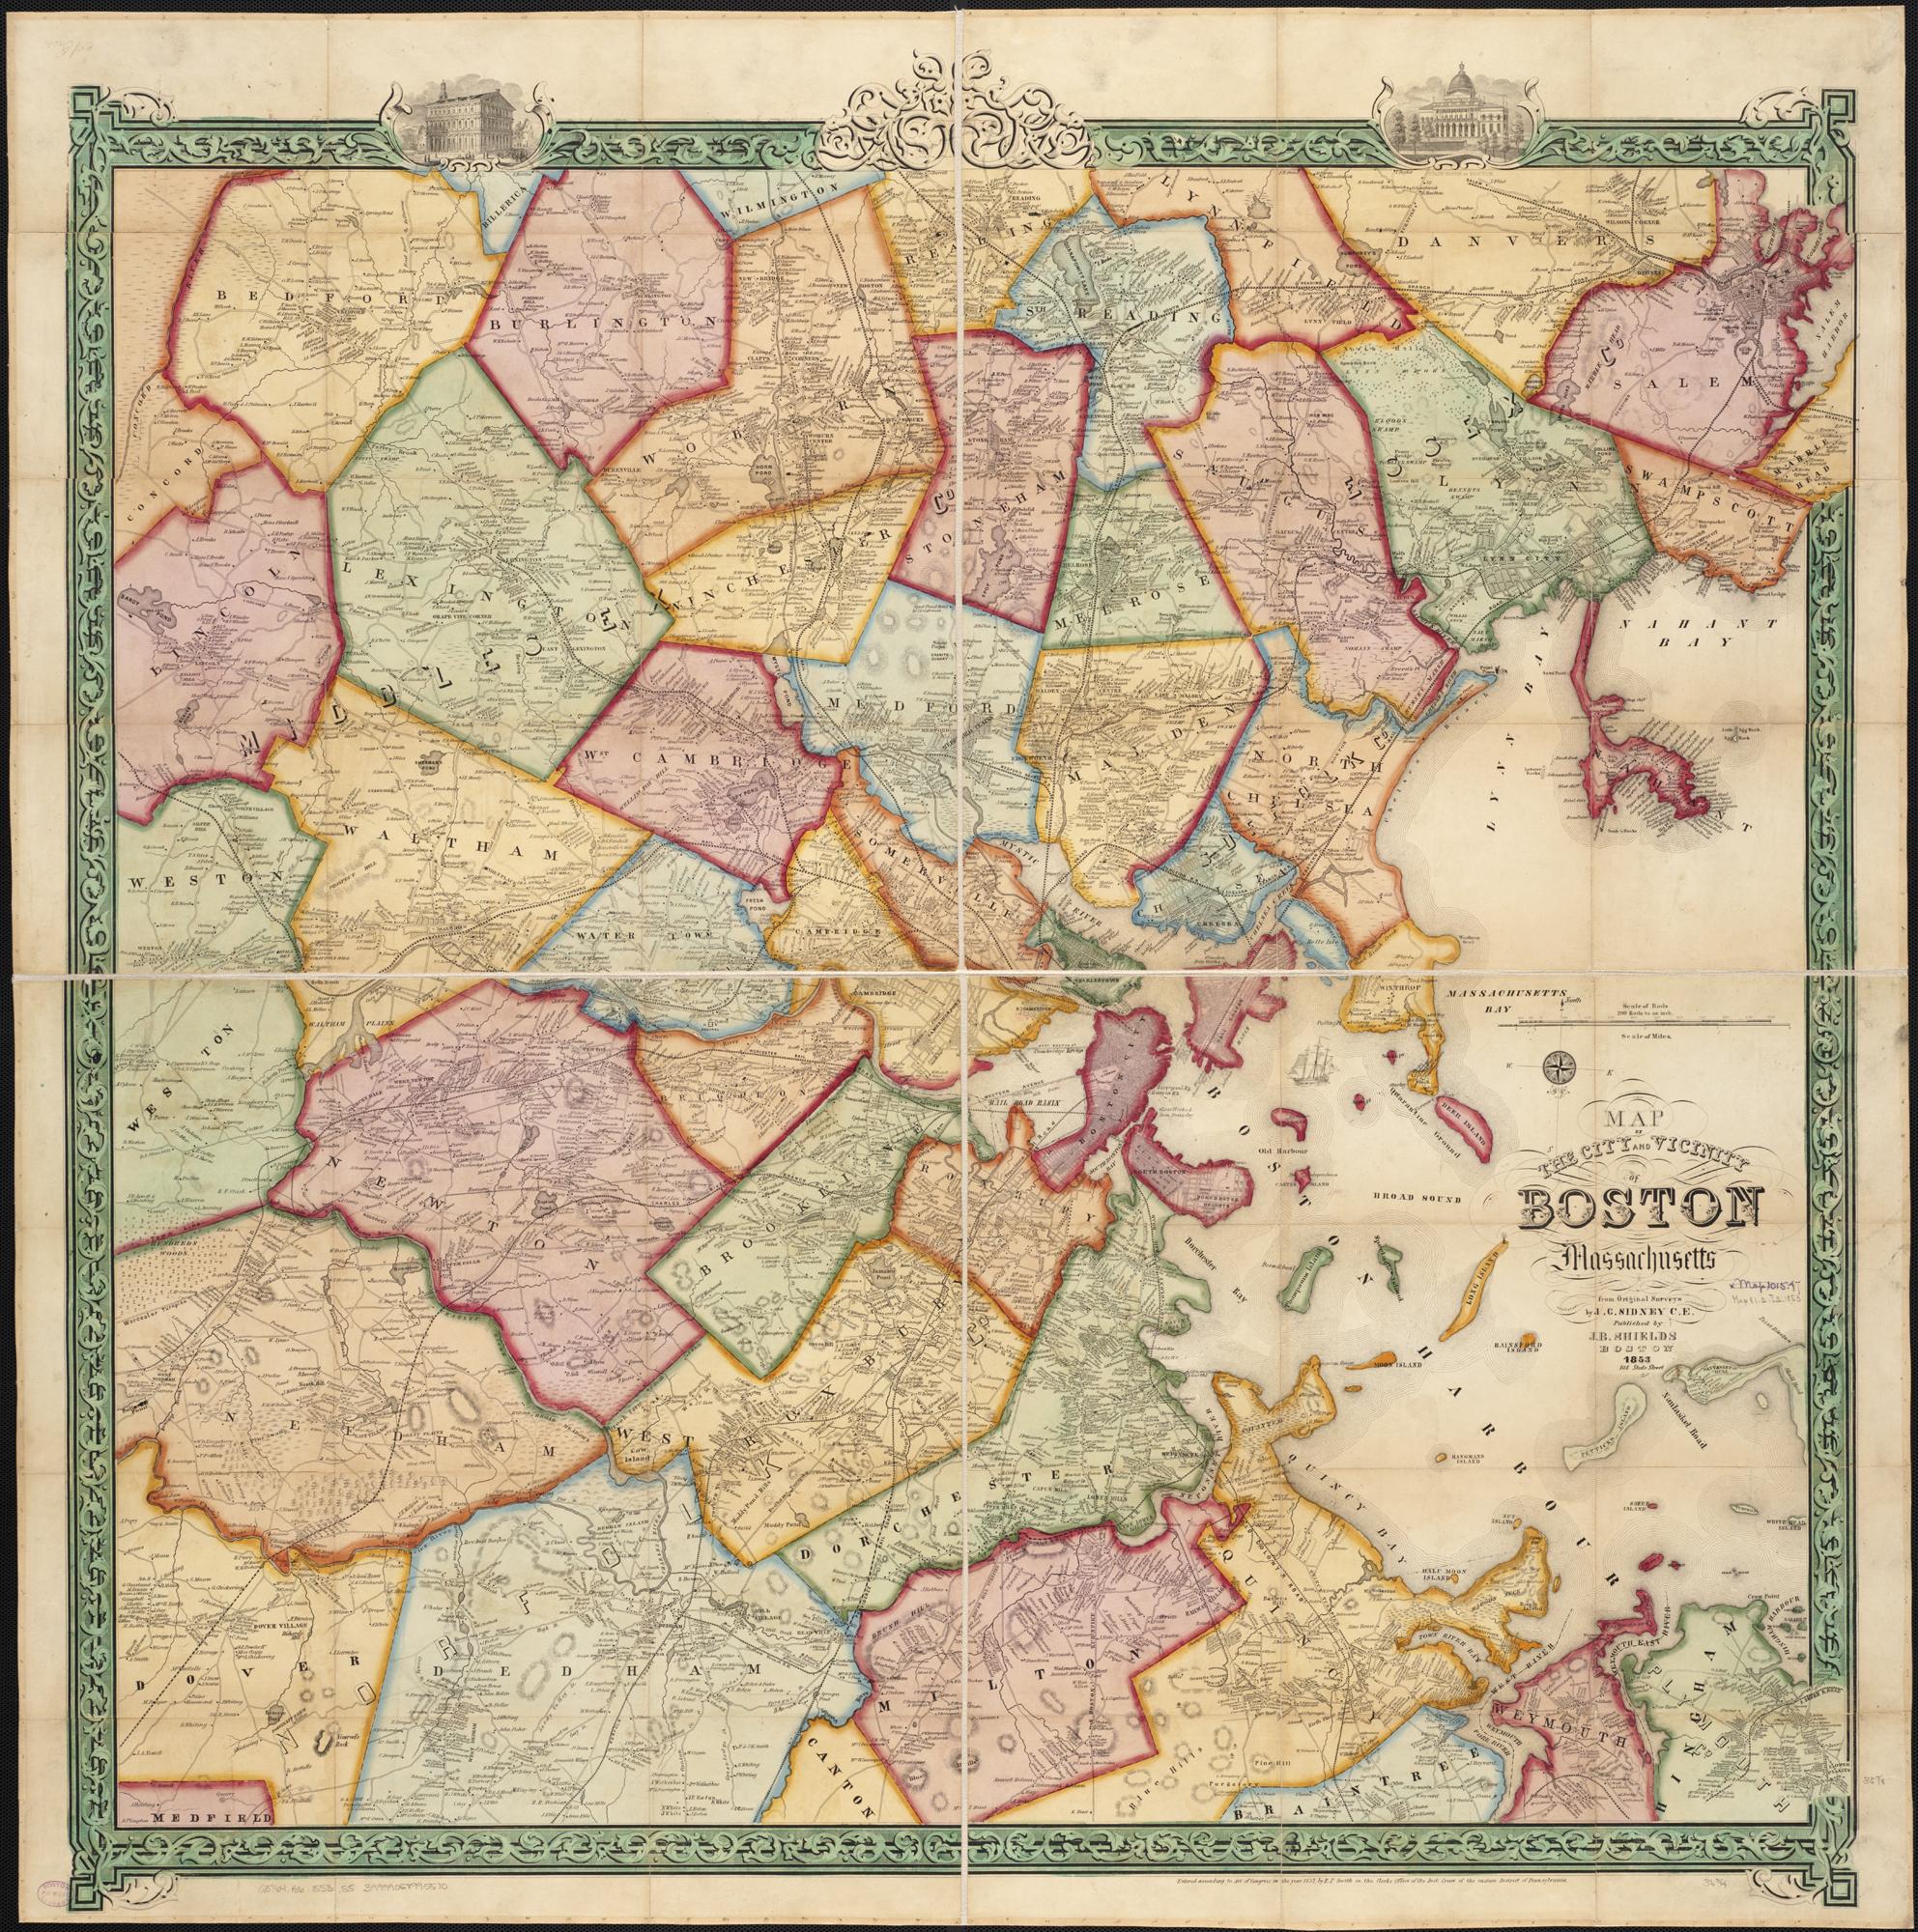 FileMap Of The City And Vicinity Of Boston Massachusetts - Map of boston vicinity